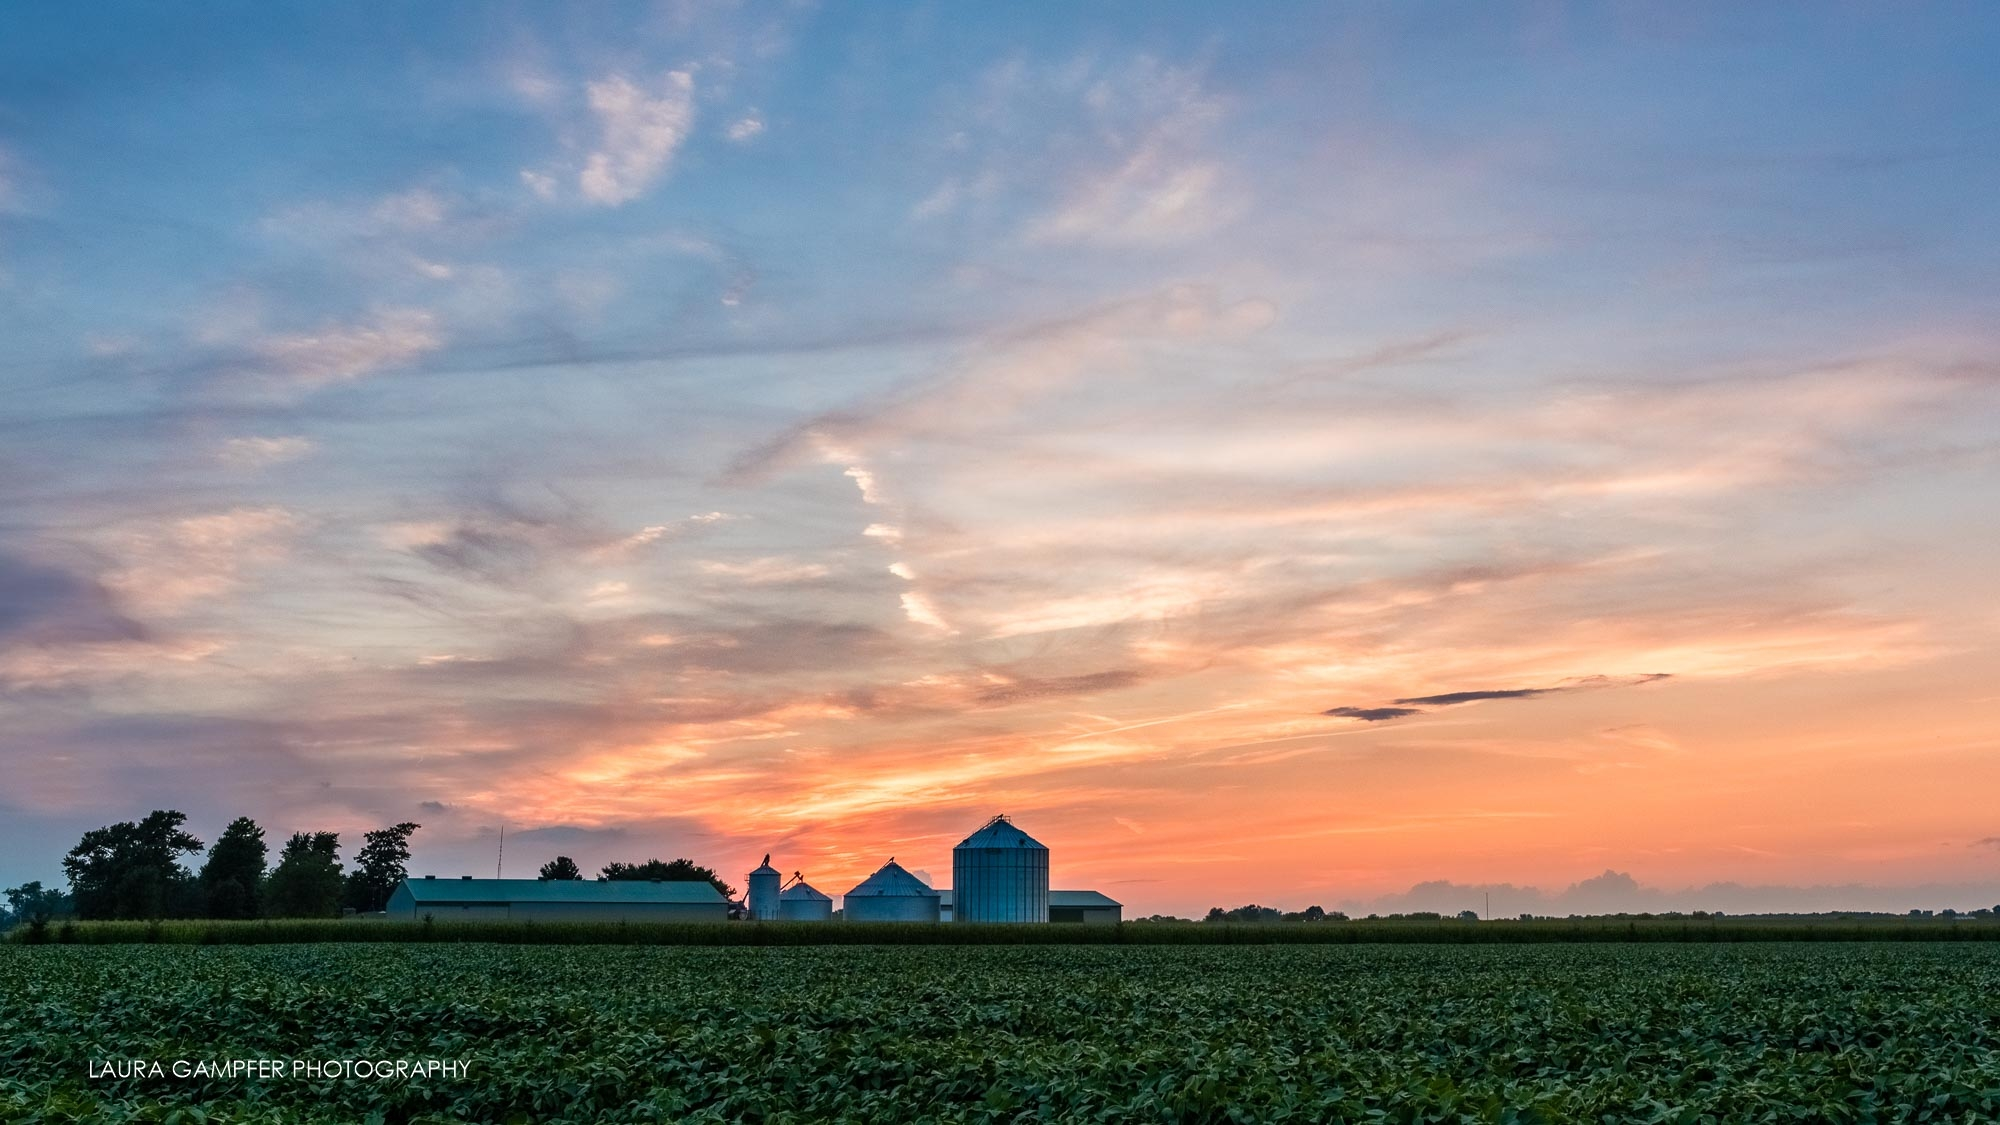 kane-county-sunset-farm-rural-il